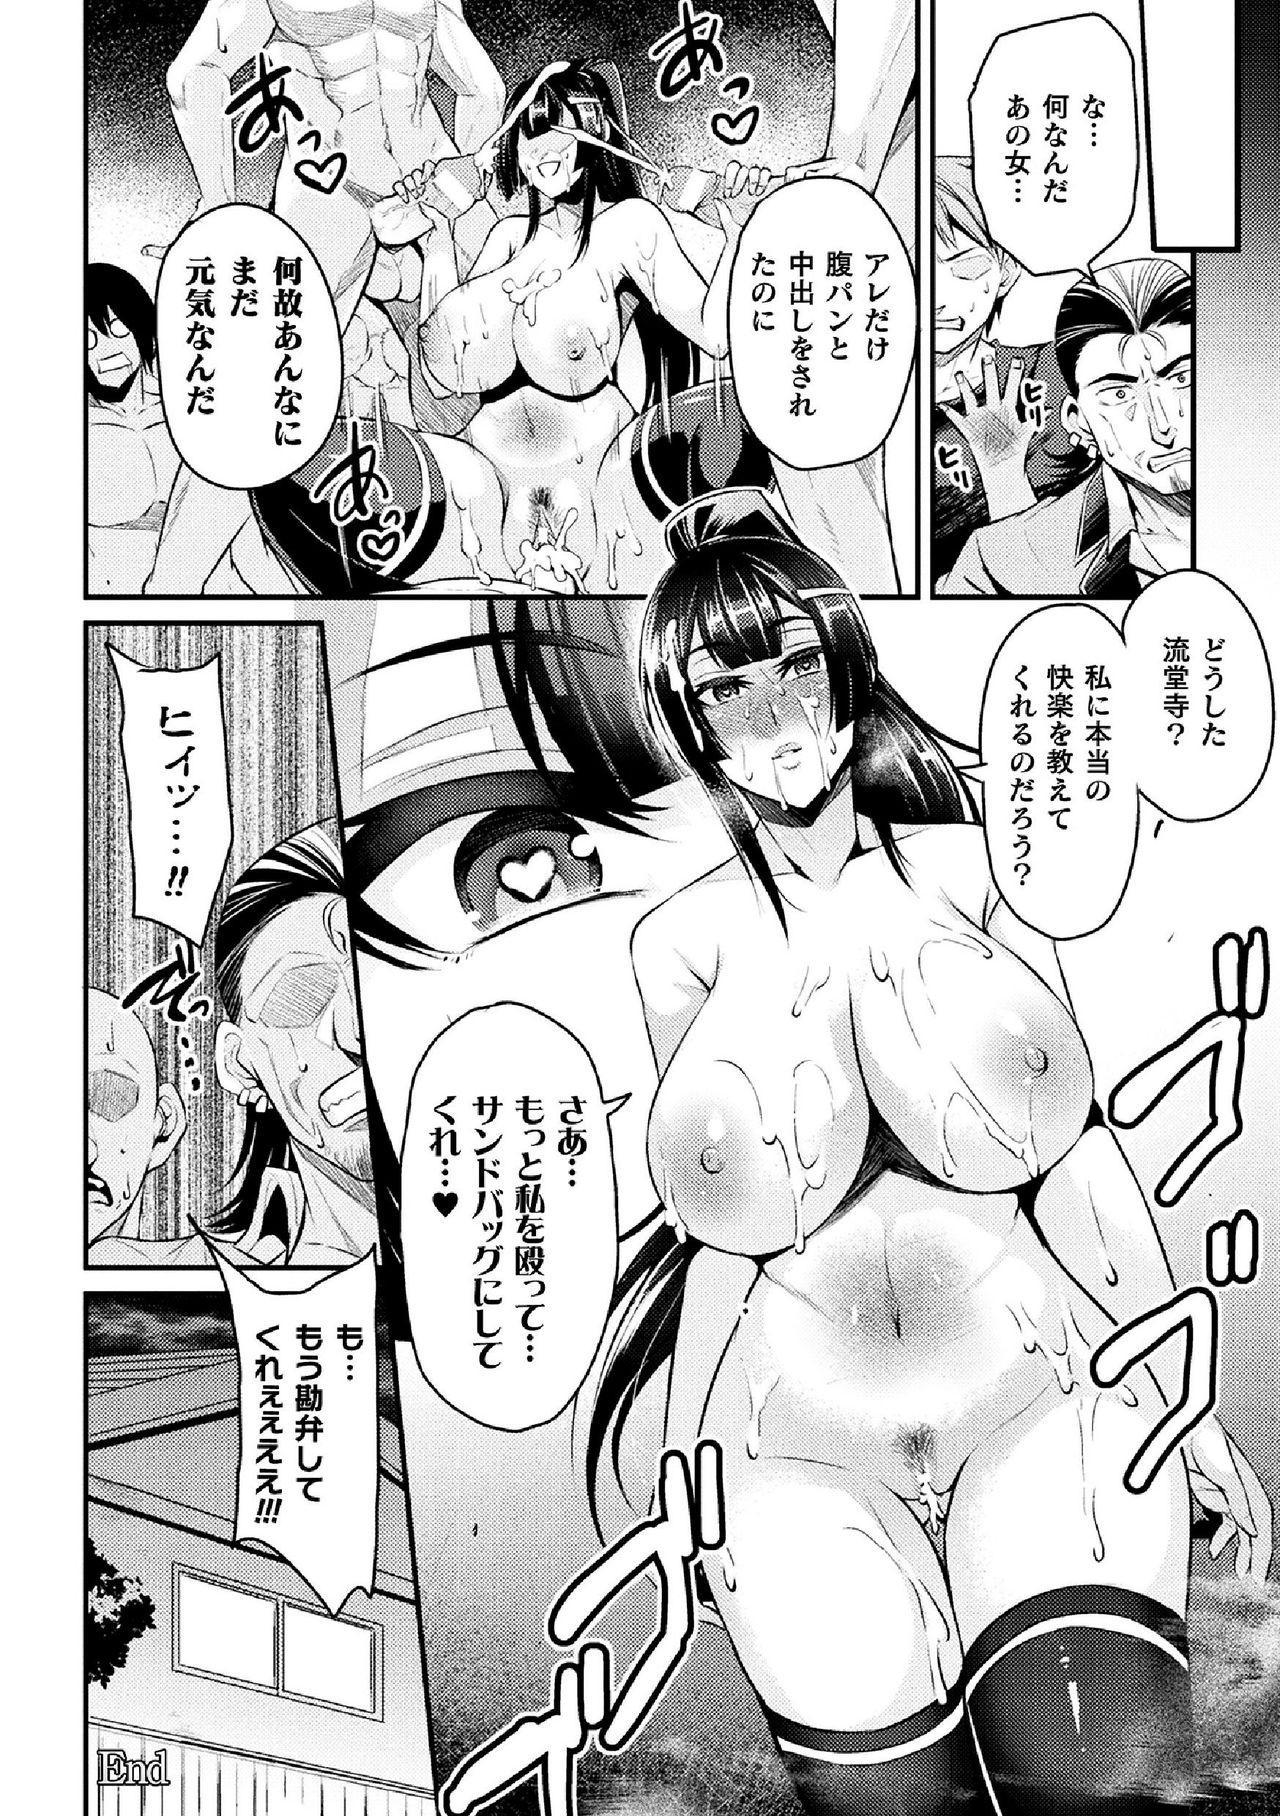 2D Comic Magazine Namaiki Onna ni HaraPun Seisai! Vol. 2 21